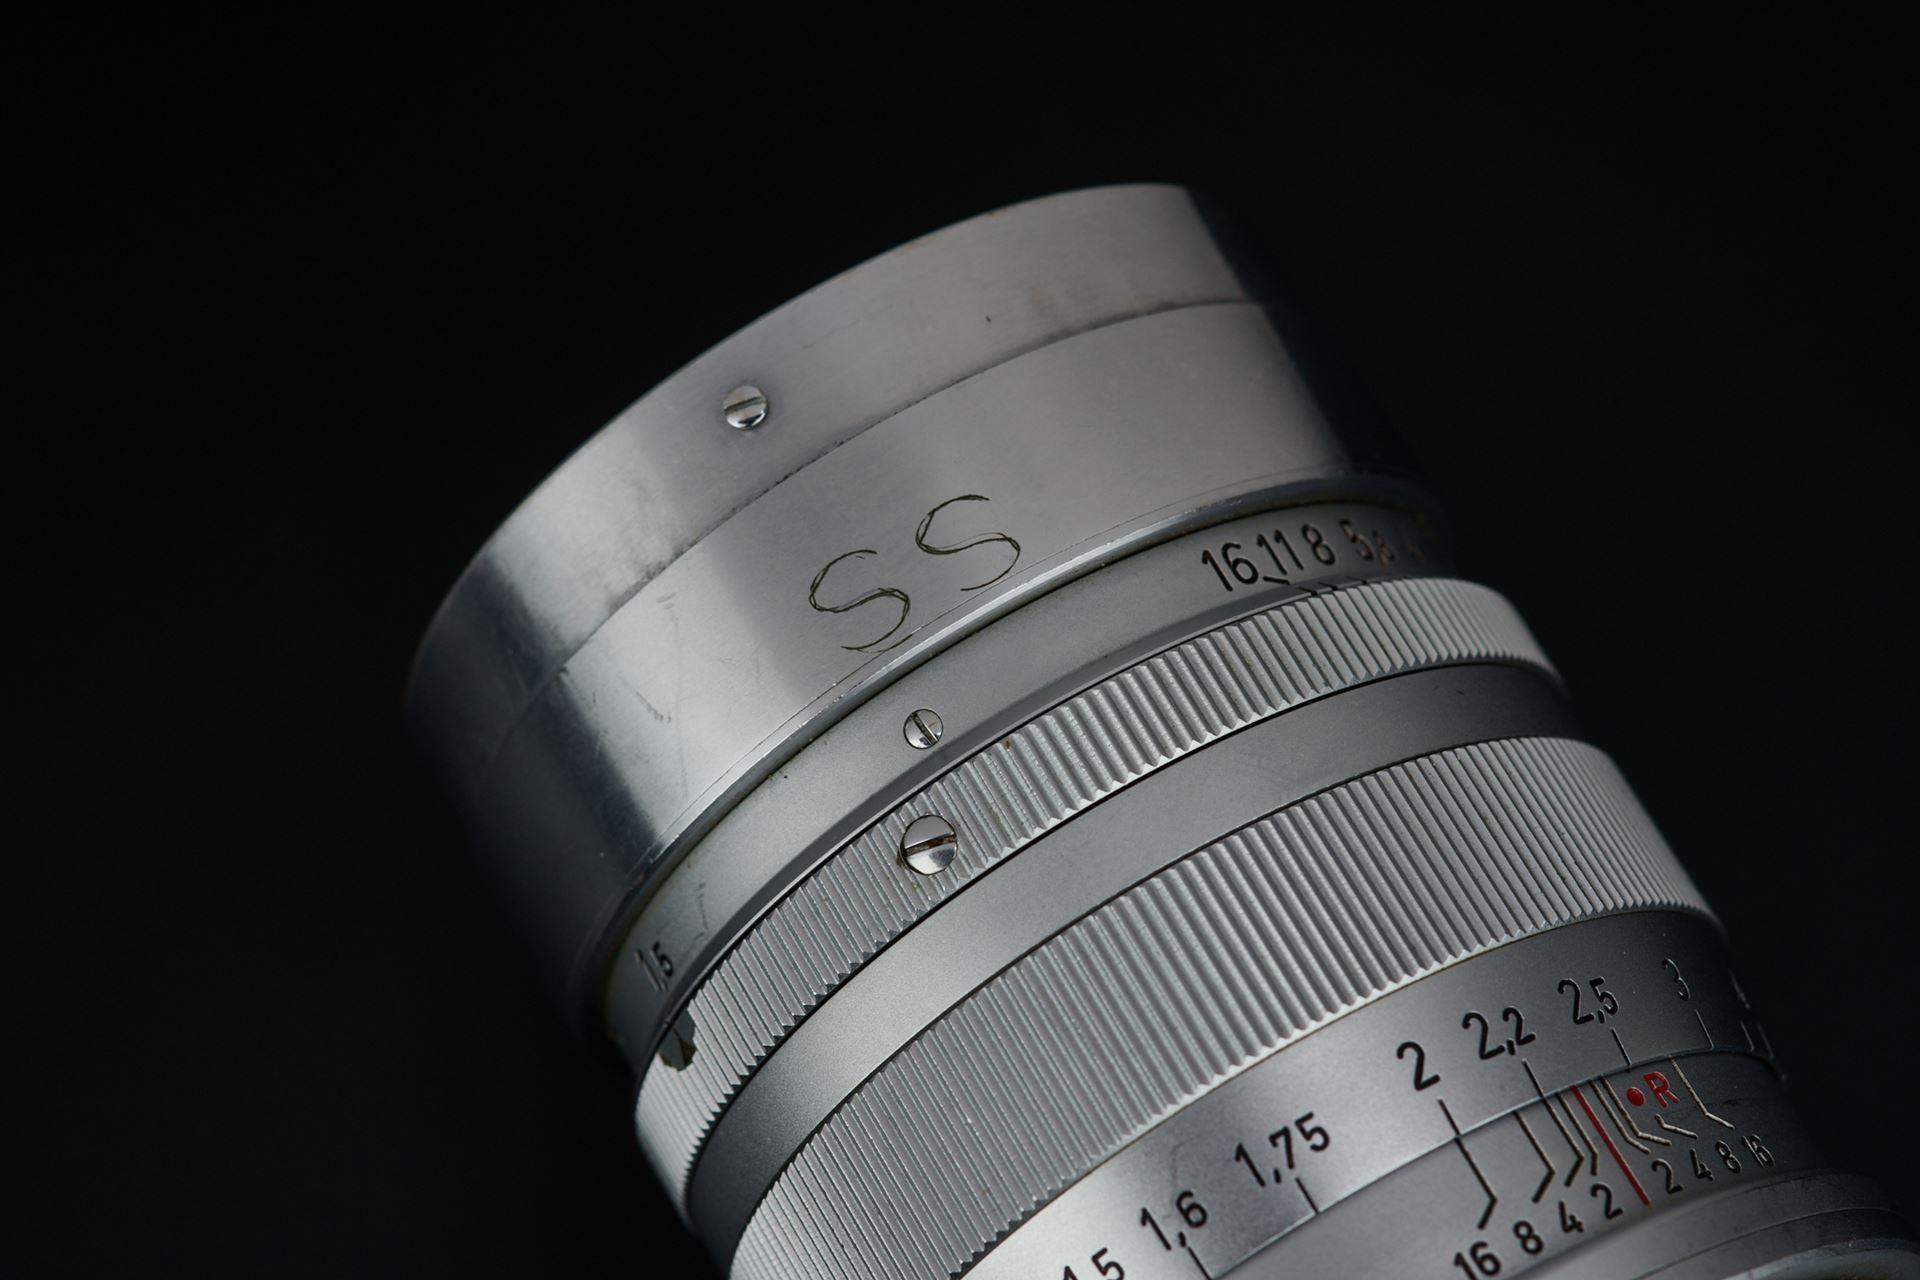 Picture of leica summarex 8.5cm f/1.5 silver screw ltm